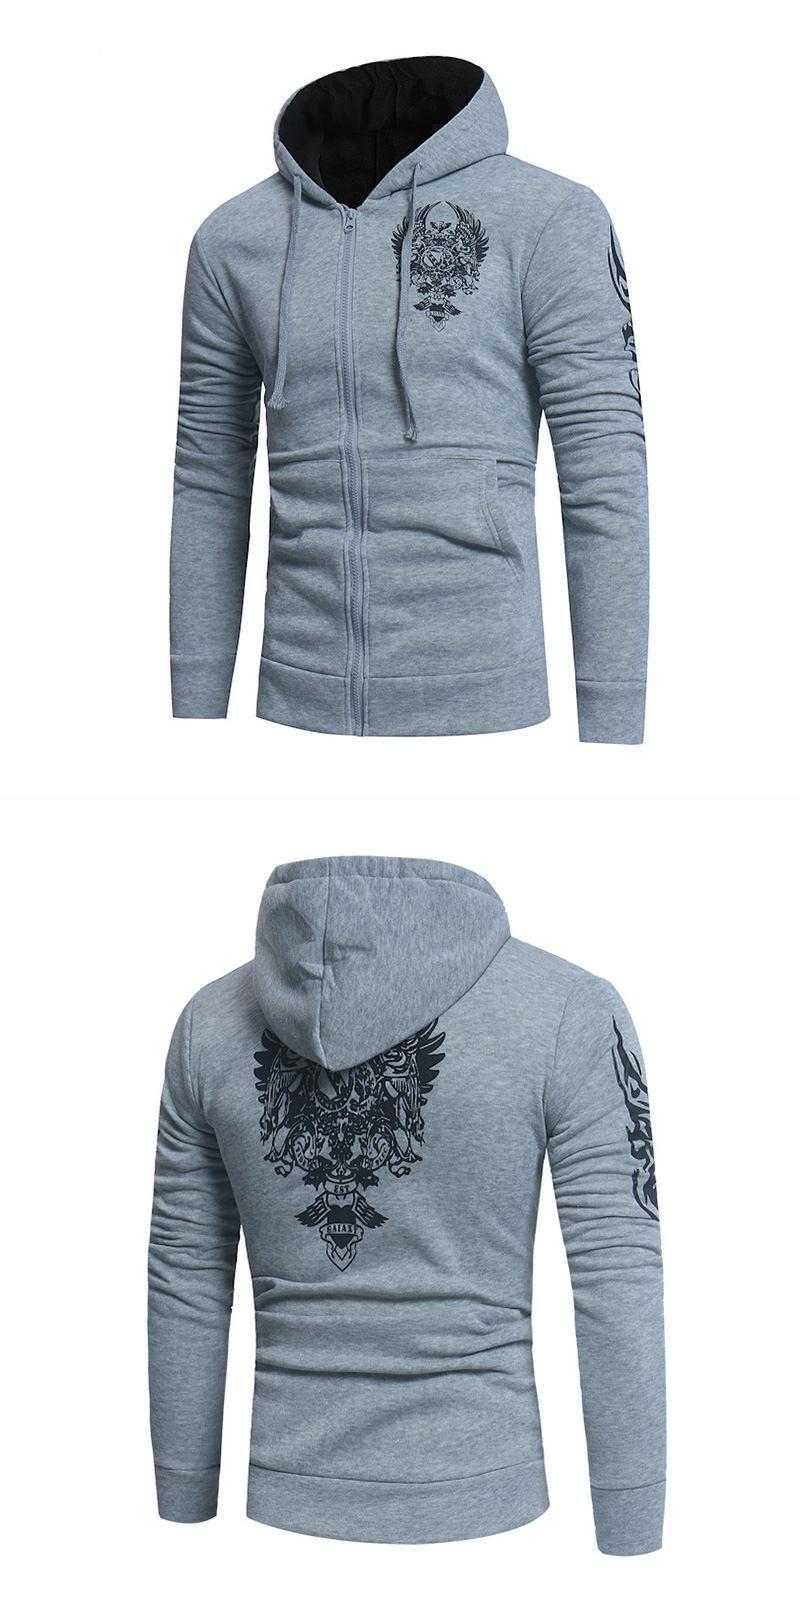 Womens Camouflage Hoodies Coat Sweatshirt Hooded Zip Baseball Jacket Crop Tops